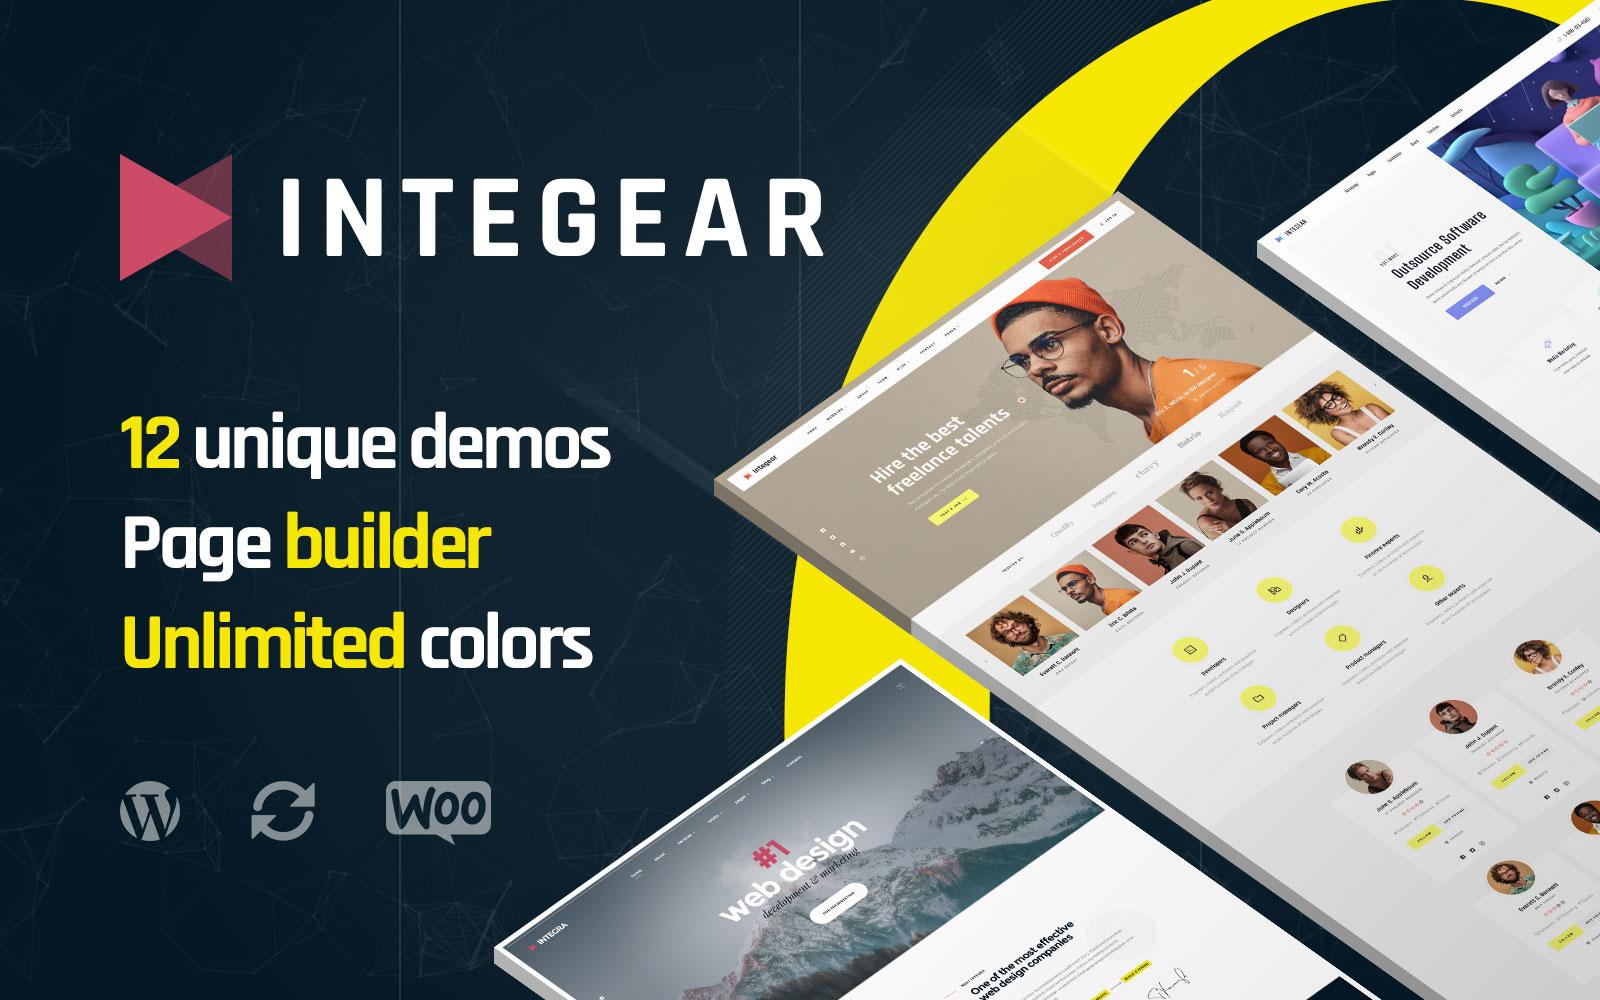 Integear - IT Company and Web Design Agency WordPress Theme